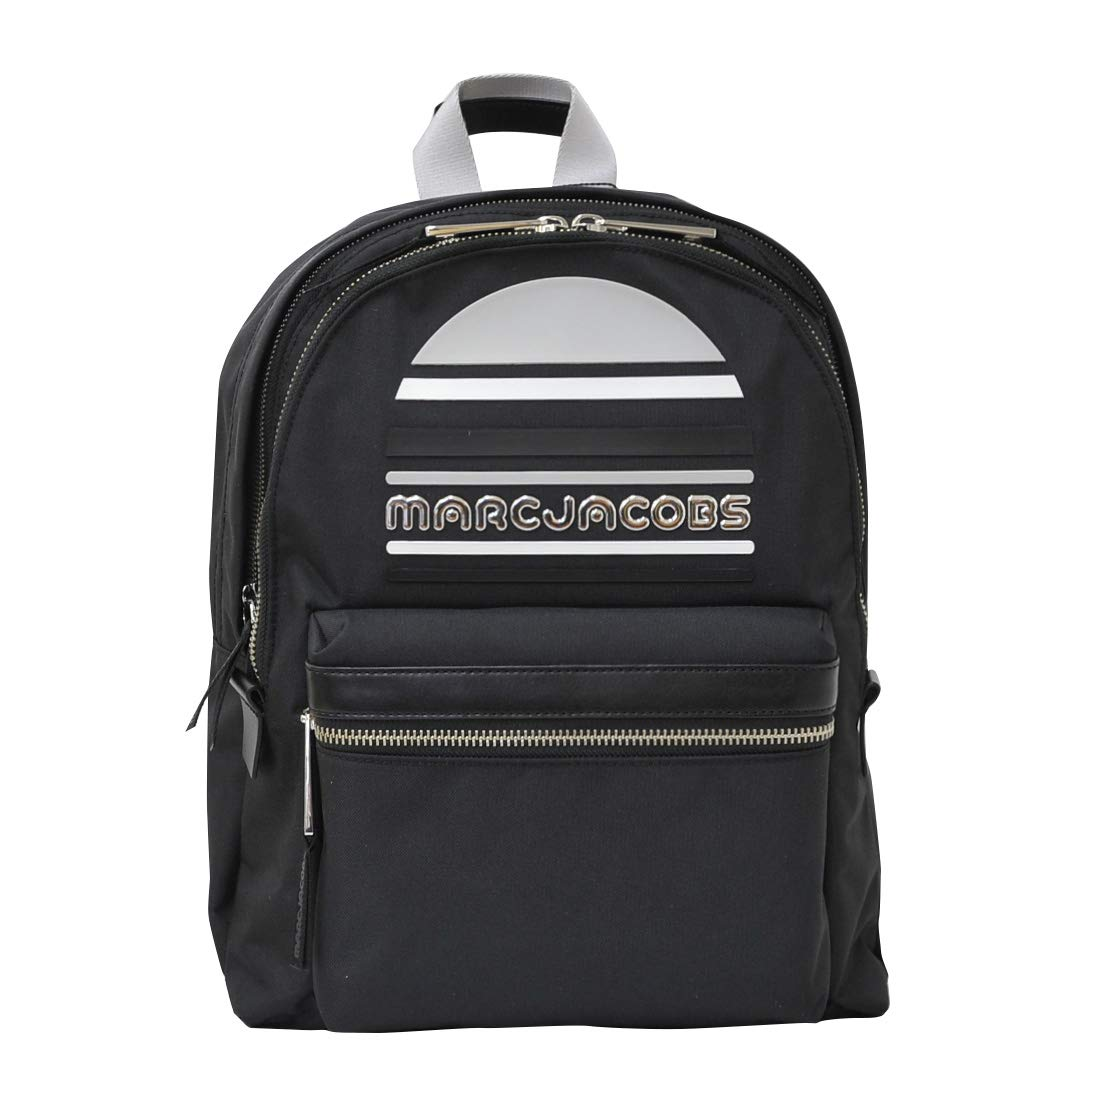 MARC JACOBS TREK PACK LARGE LOGO BACKPACK BLACK M0014034-001 [並行輸入品]   B07NQDX161